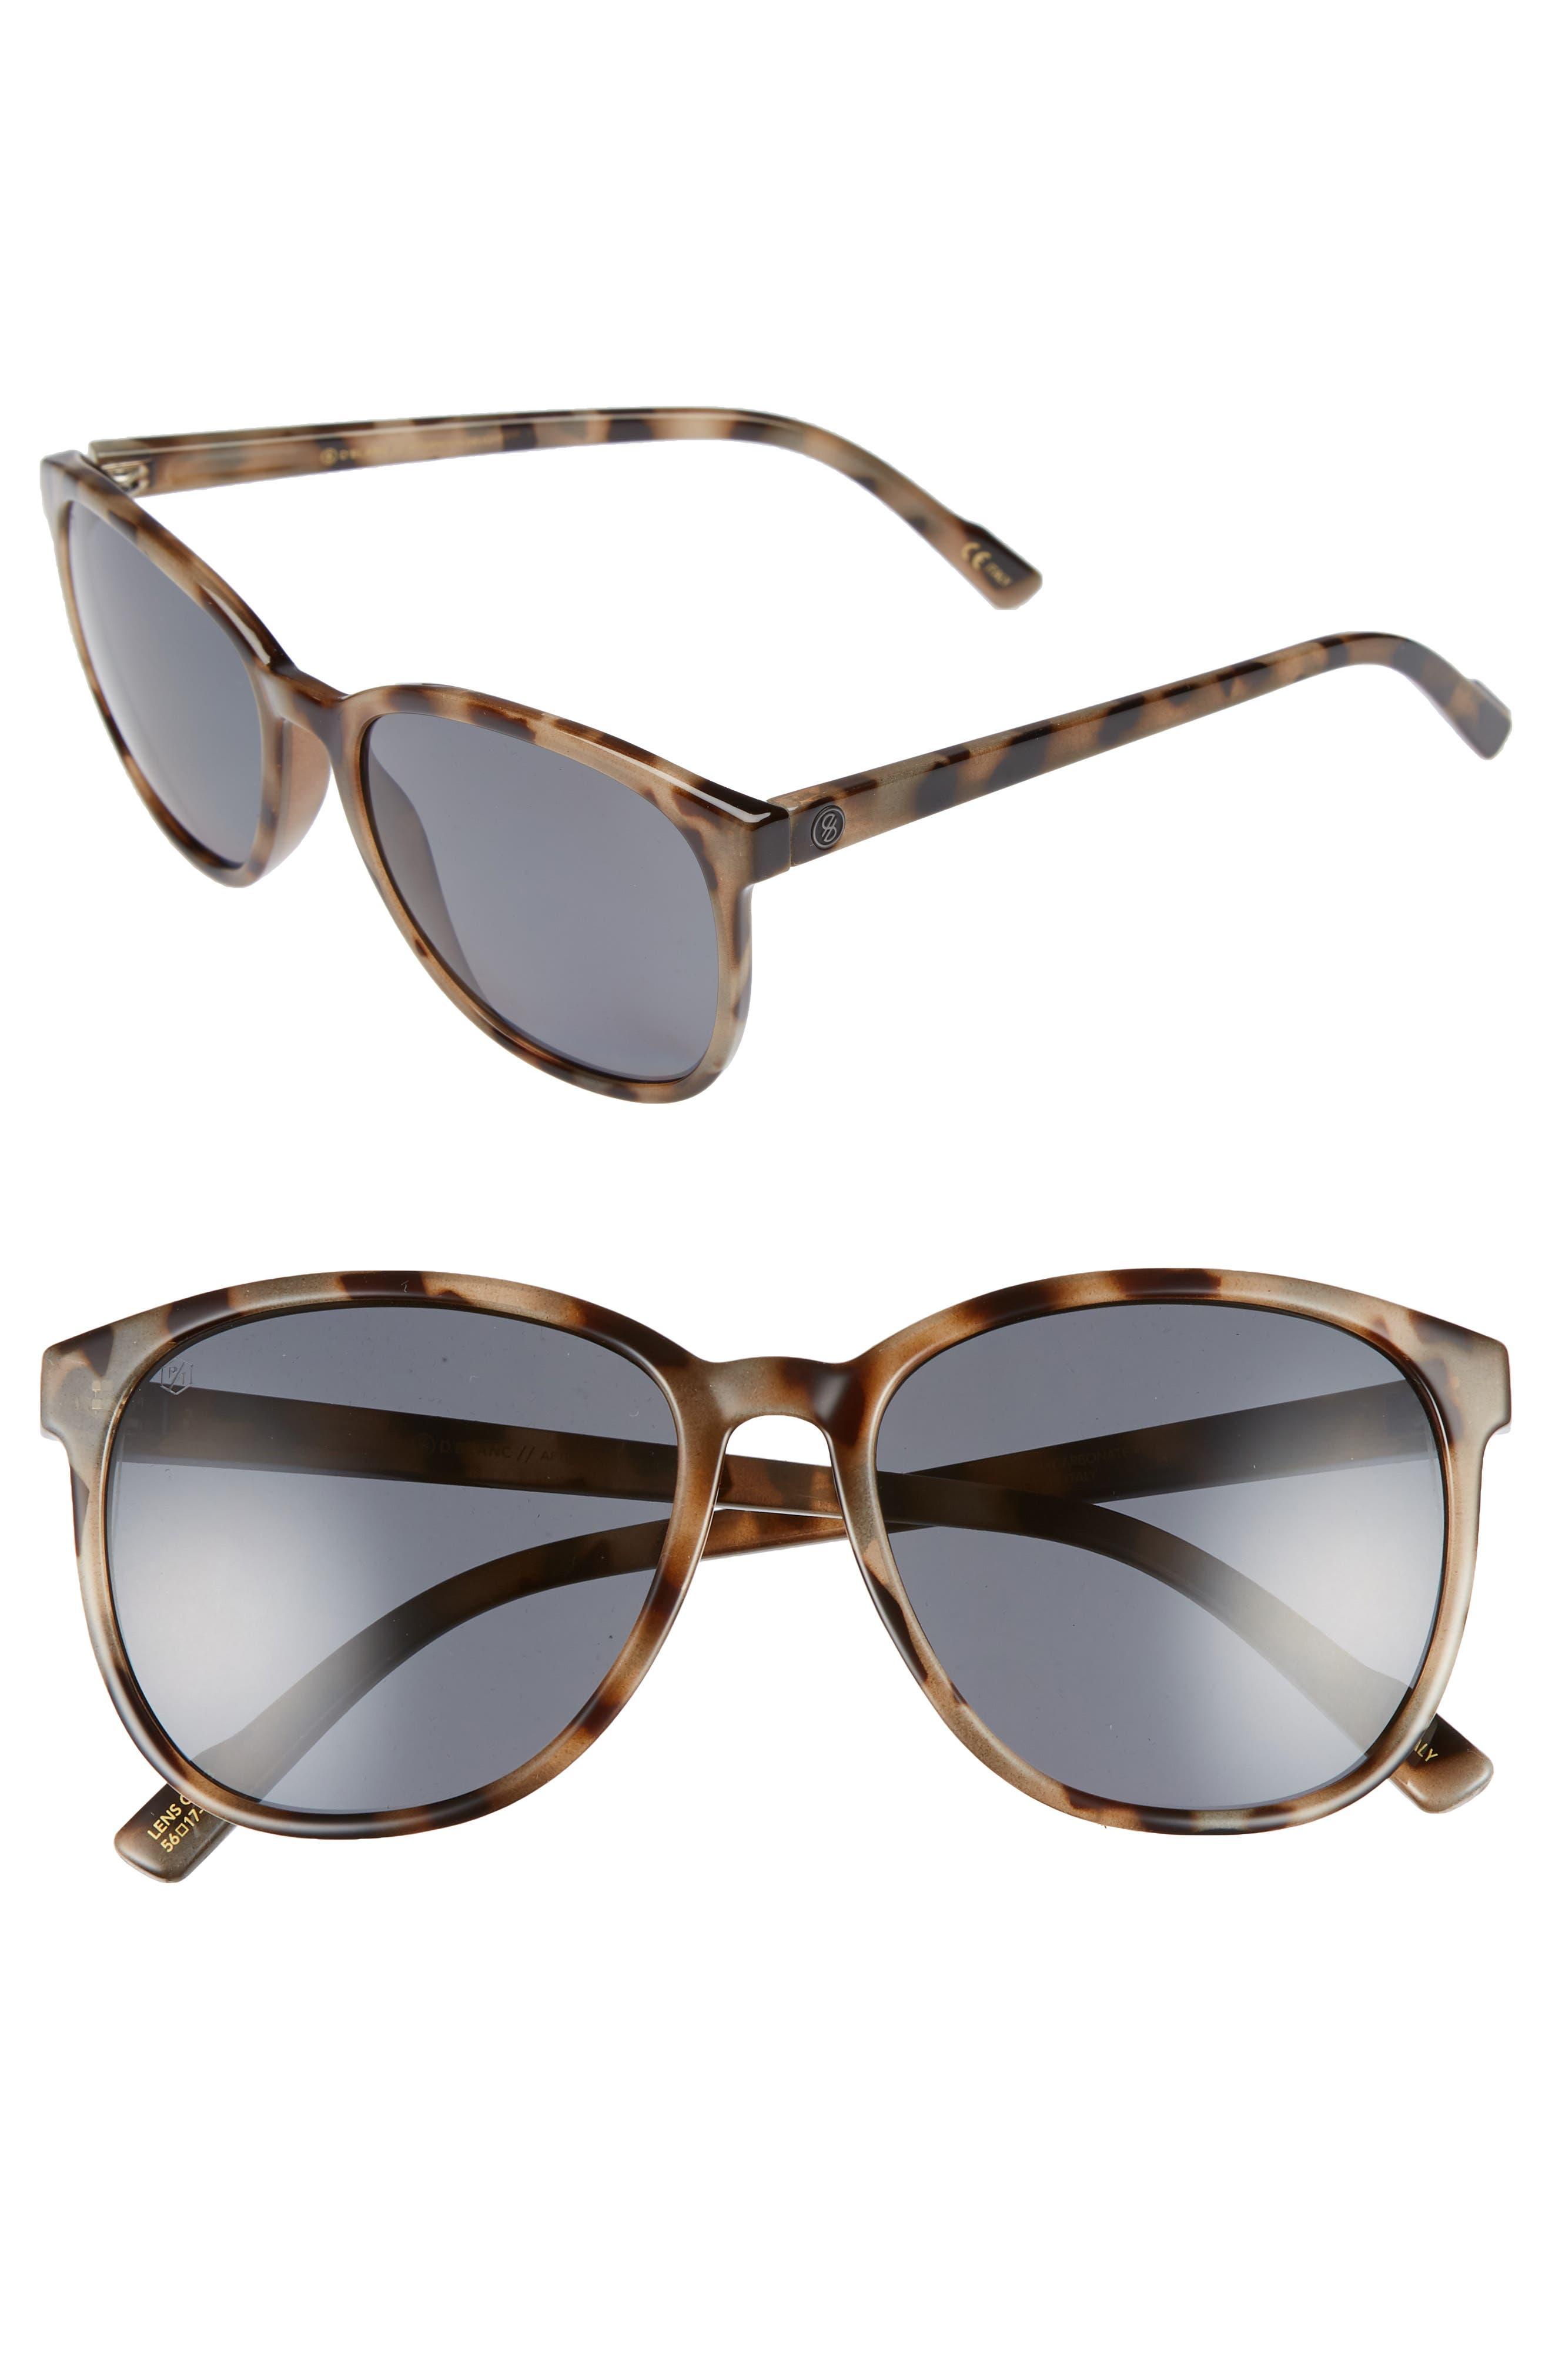 D'BLANC Afternoon Delight 56mm Polarized Sunglasses,                         Main,                         color, Snow Leopard/ Grey Polar